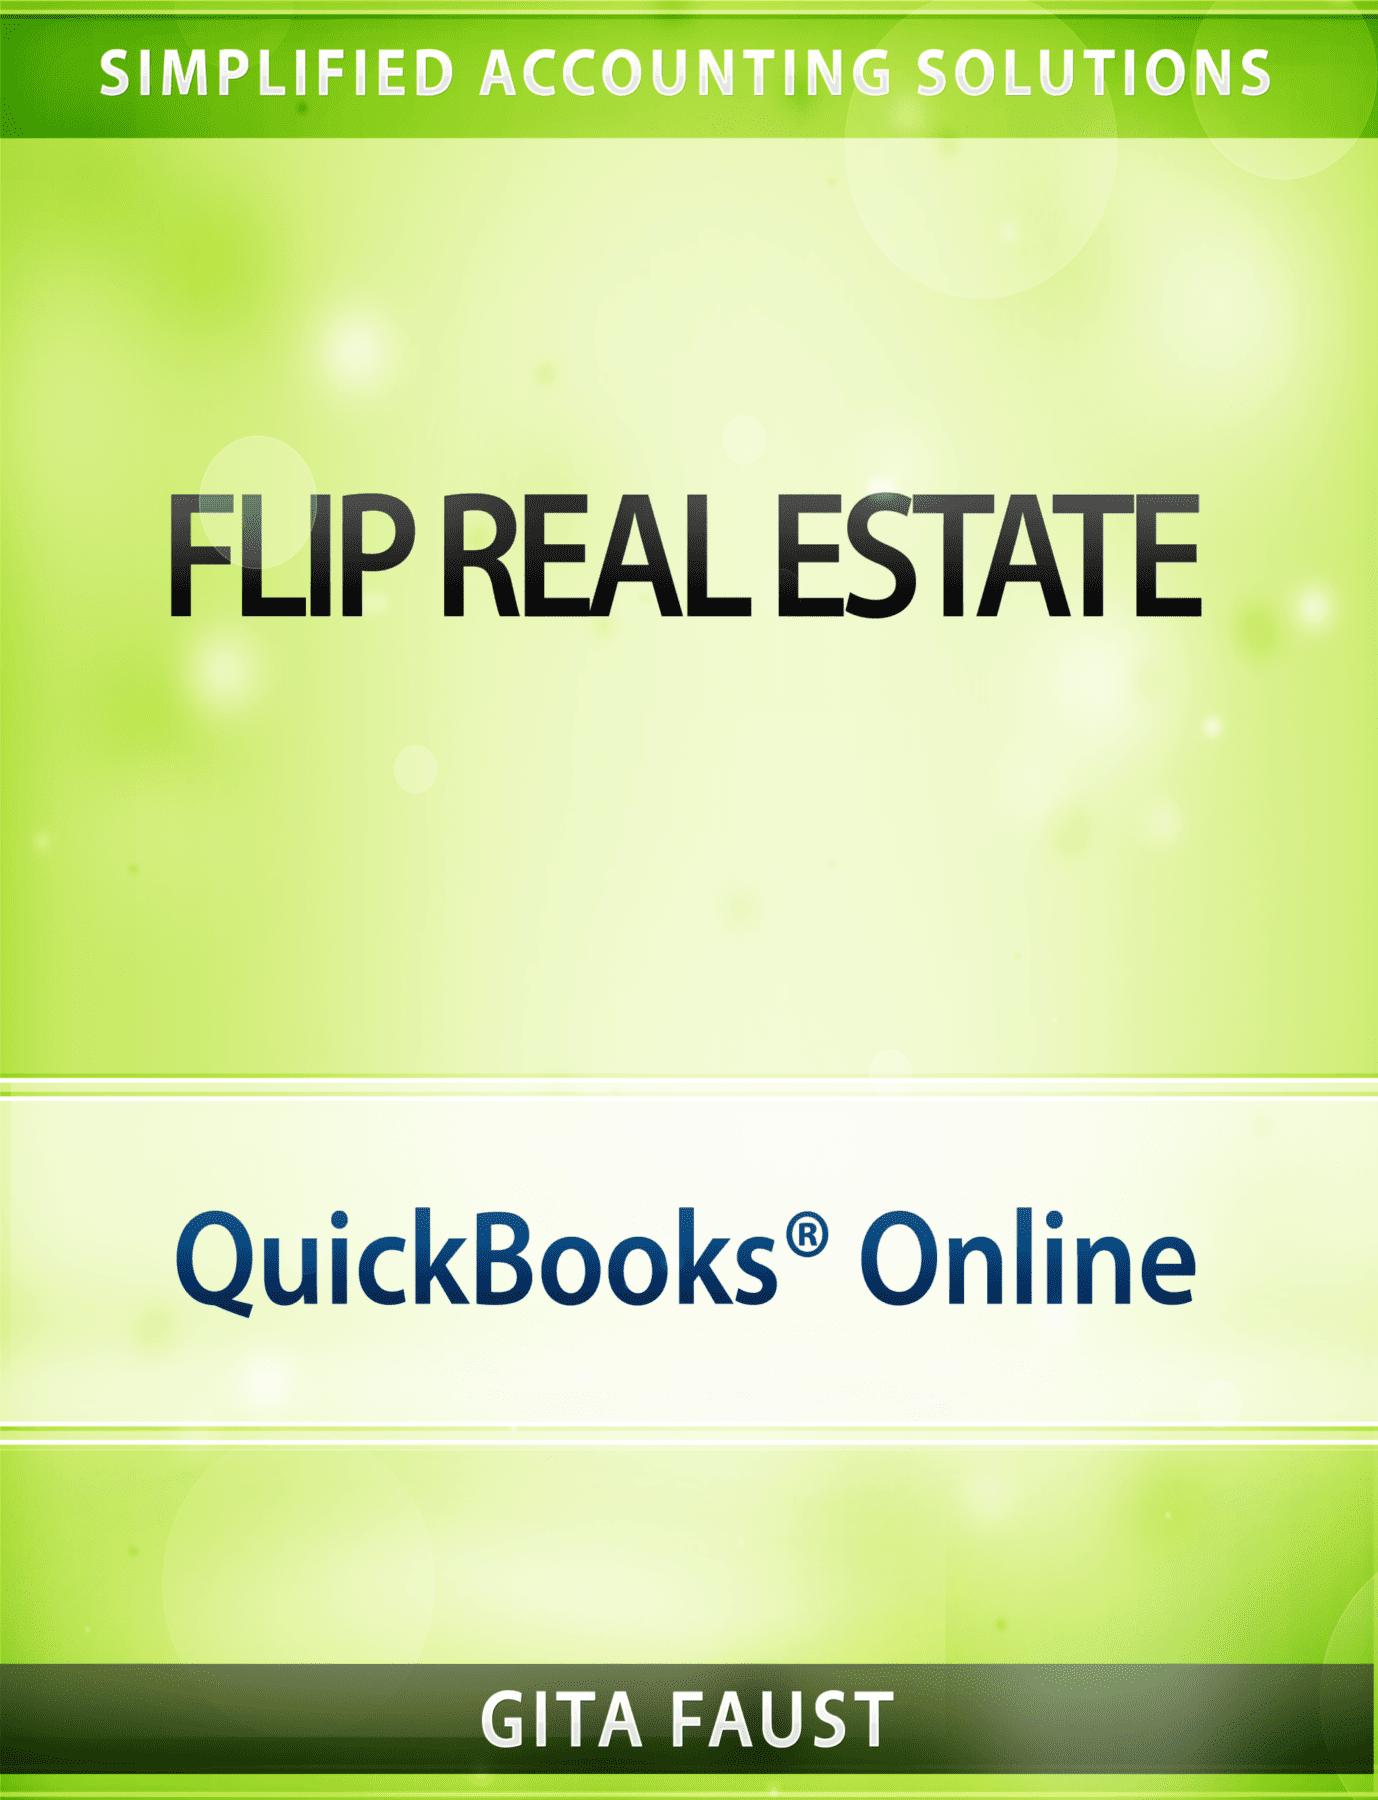 QuickBooks Online for Real Estate Flip